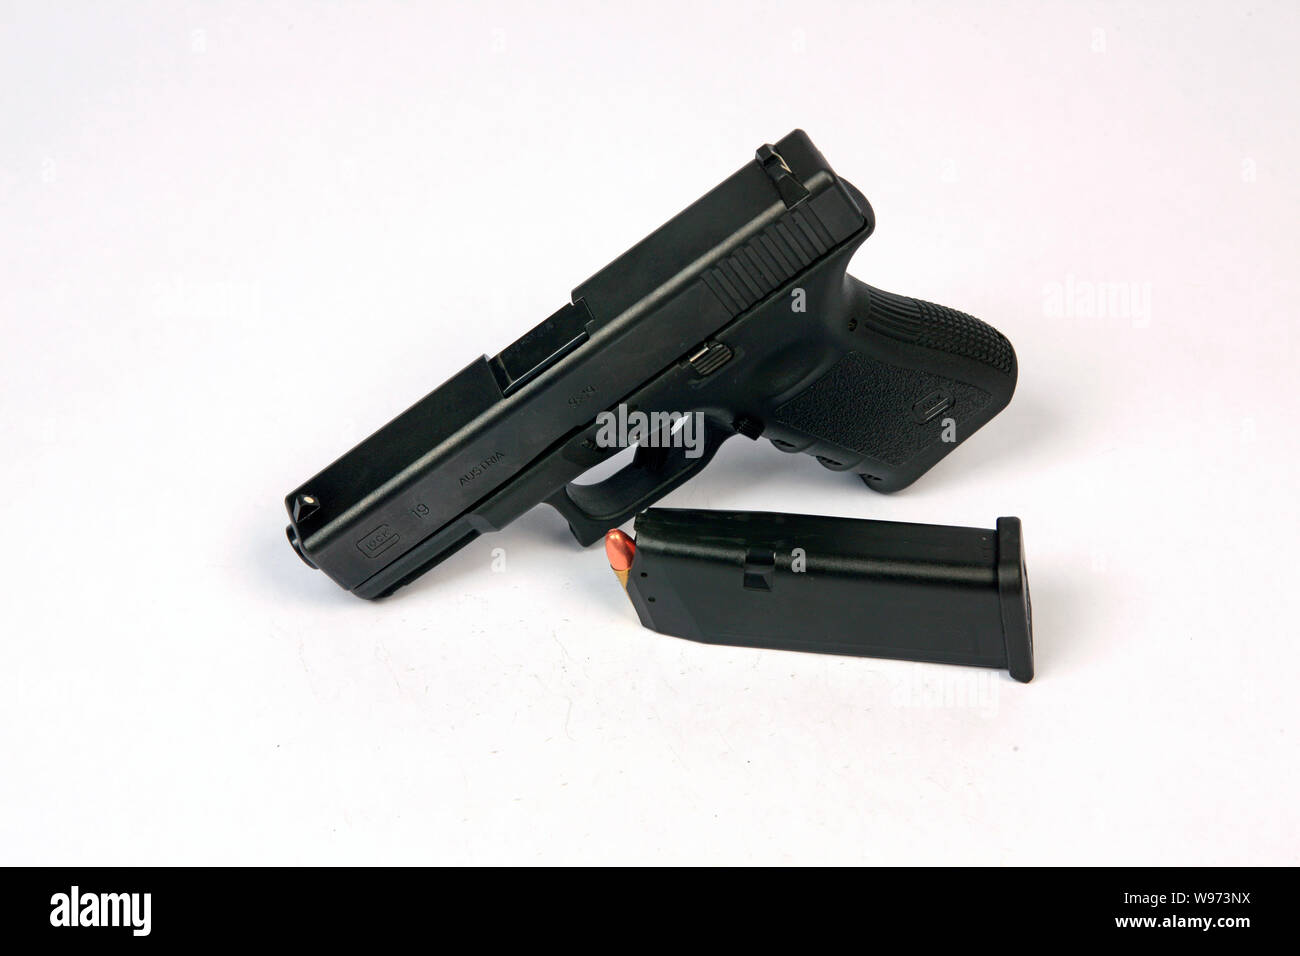 9mm Glock Pistol Stock Photos & 9mm Glock Pistol Stock